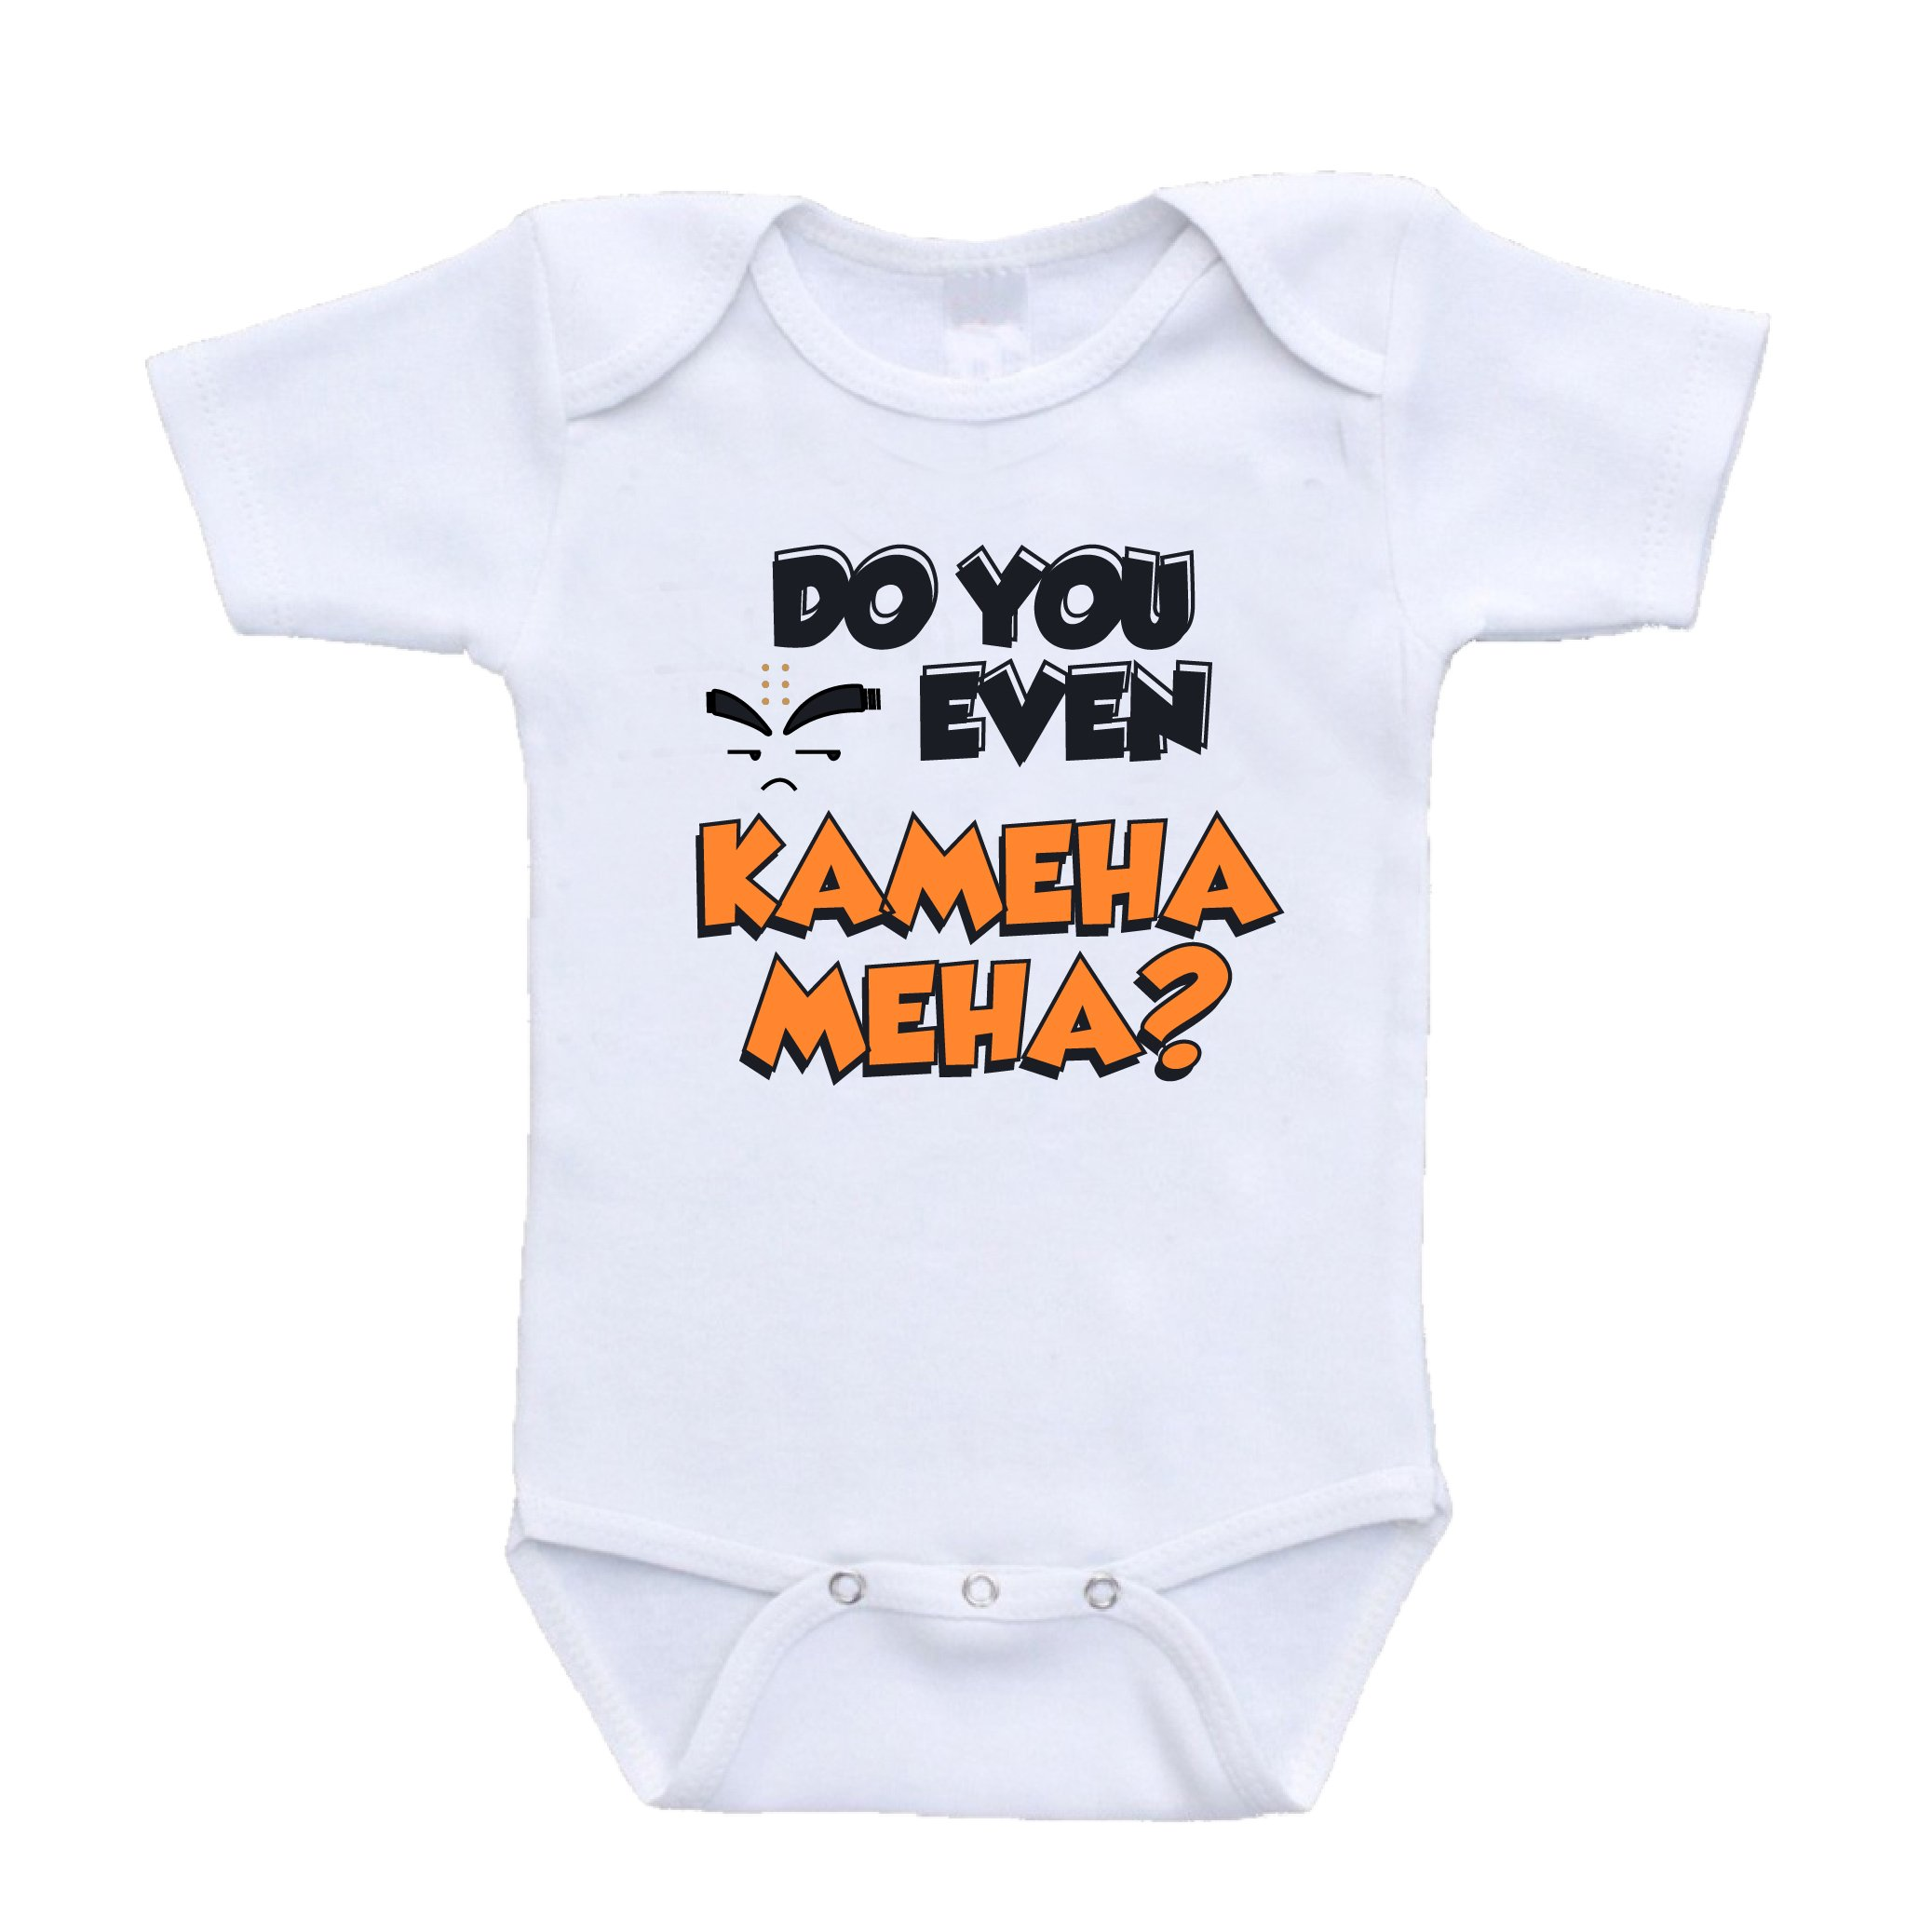 Amazon.com  Do You Even Kamehameha Dragon Ball Z Gt Parody Baby Onesies  newborn(0-3 Months)  Baby 9a787ad9a03a